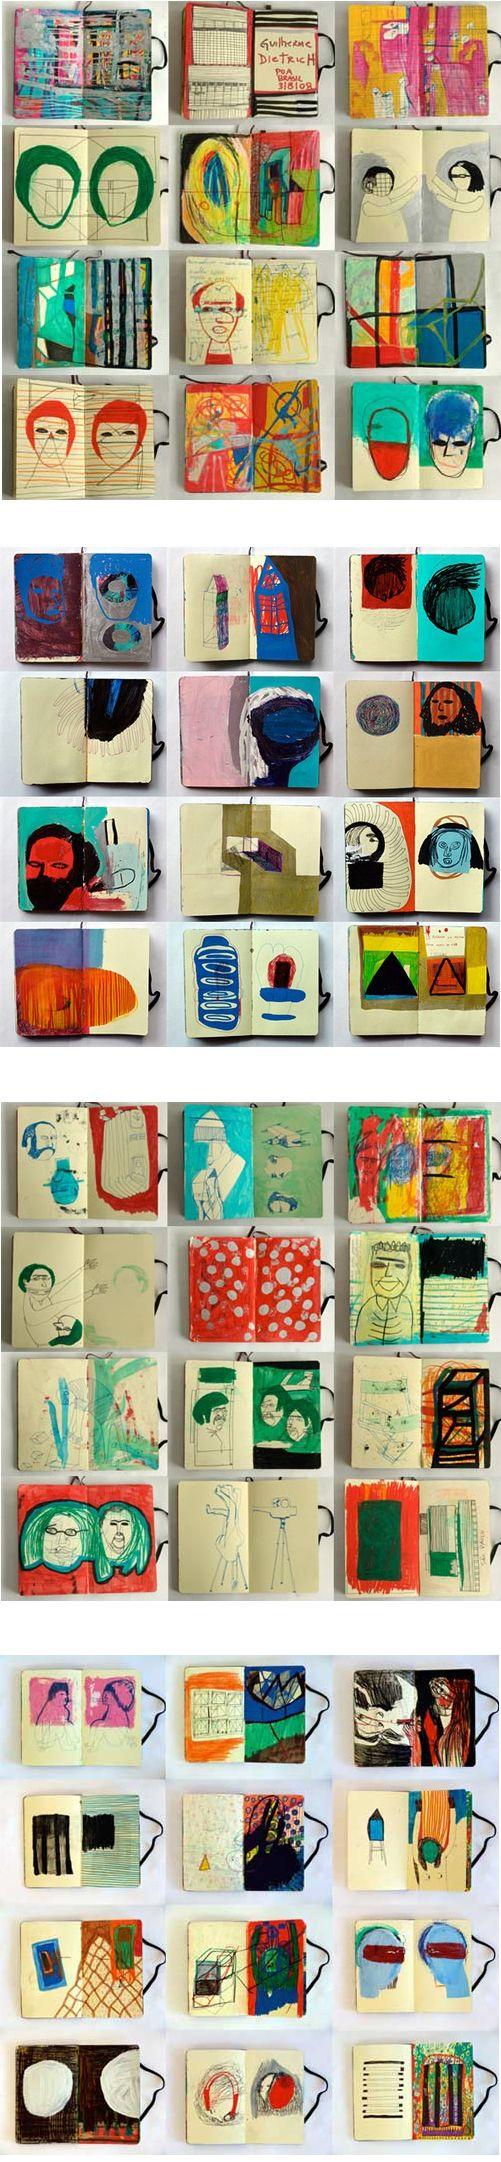 Guilherme Dietrich sketchbooks                                                                                                                                                     More